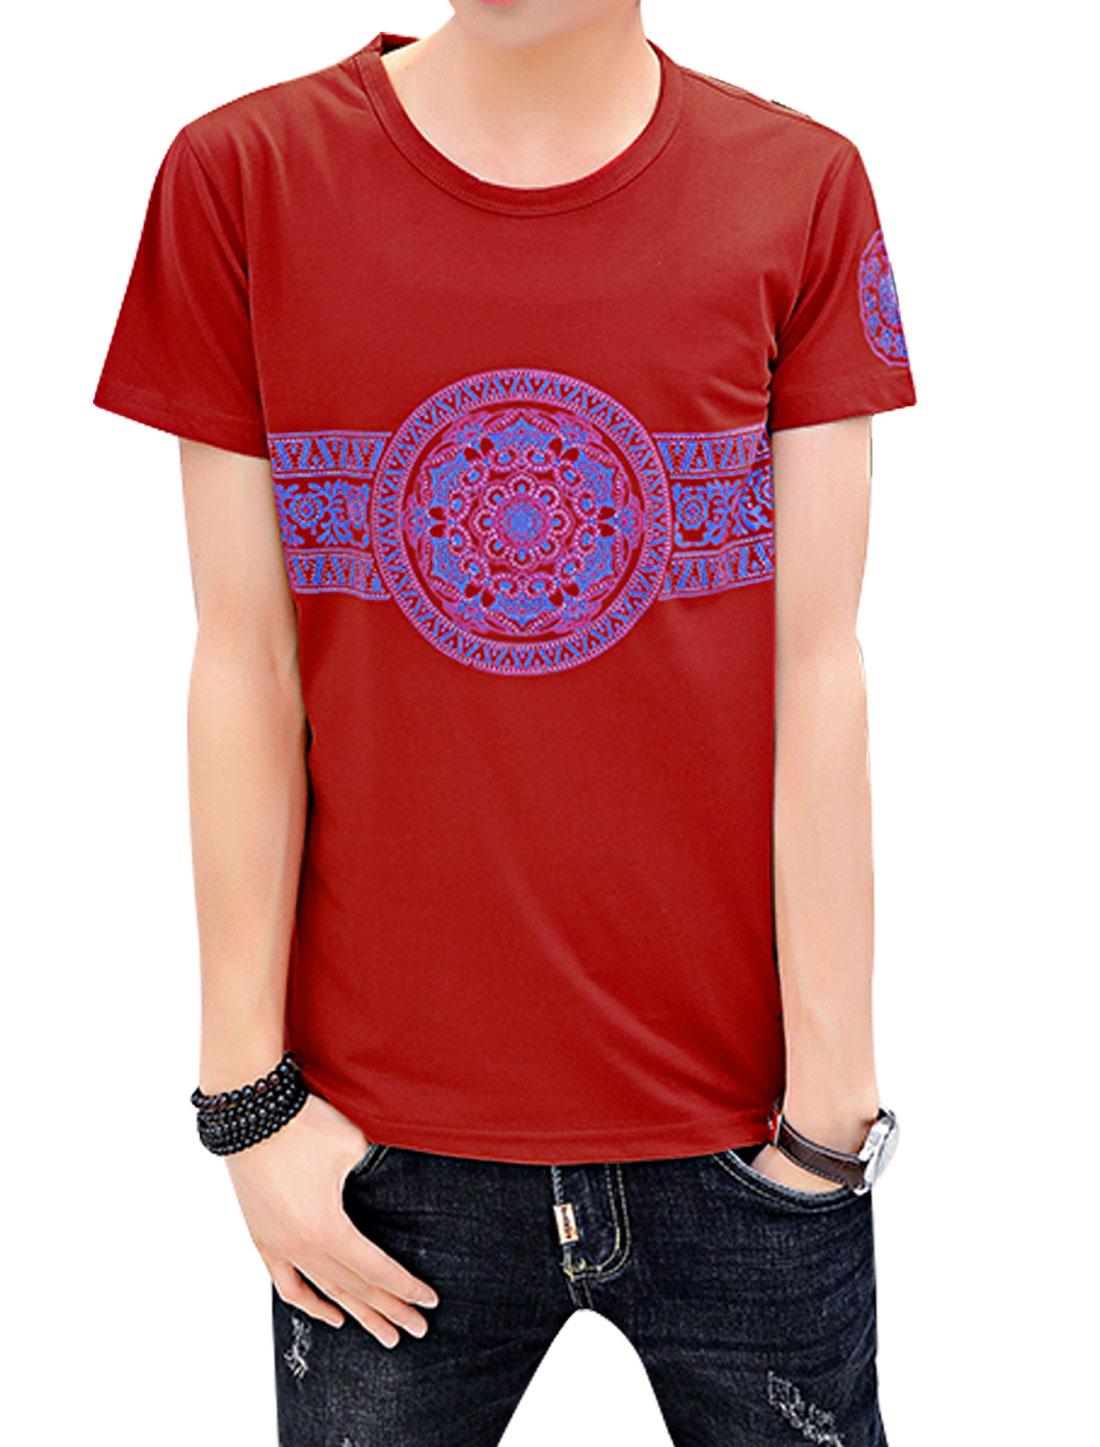 Men Short Sleeve Round Neck Geometric Print Leisure T-Shirts Red M